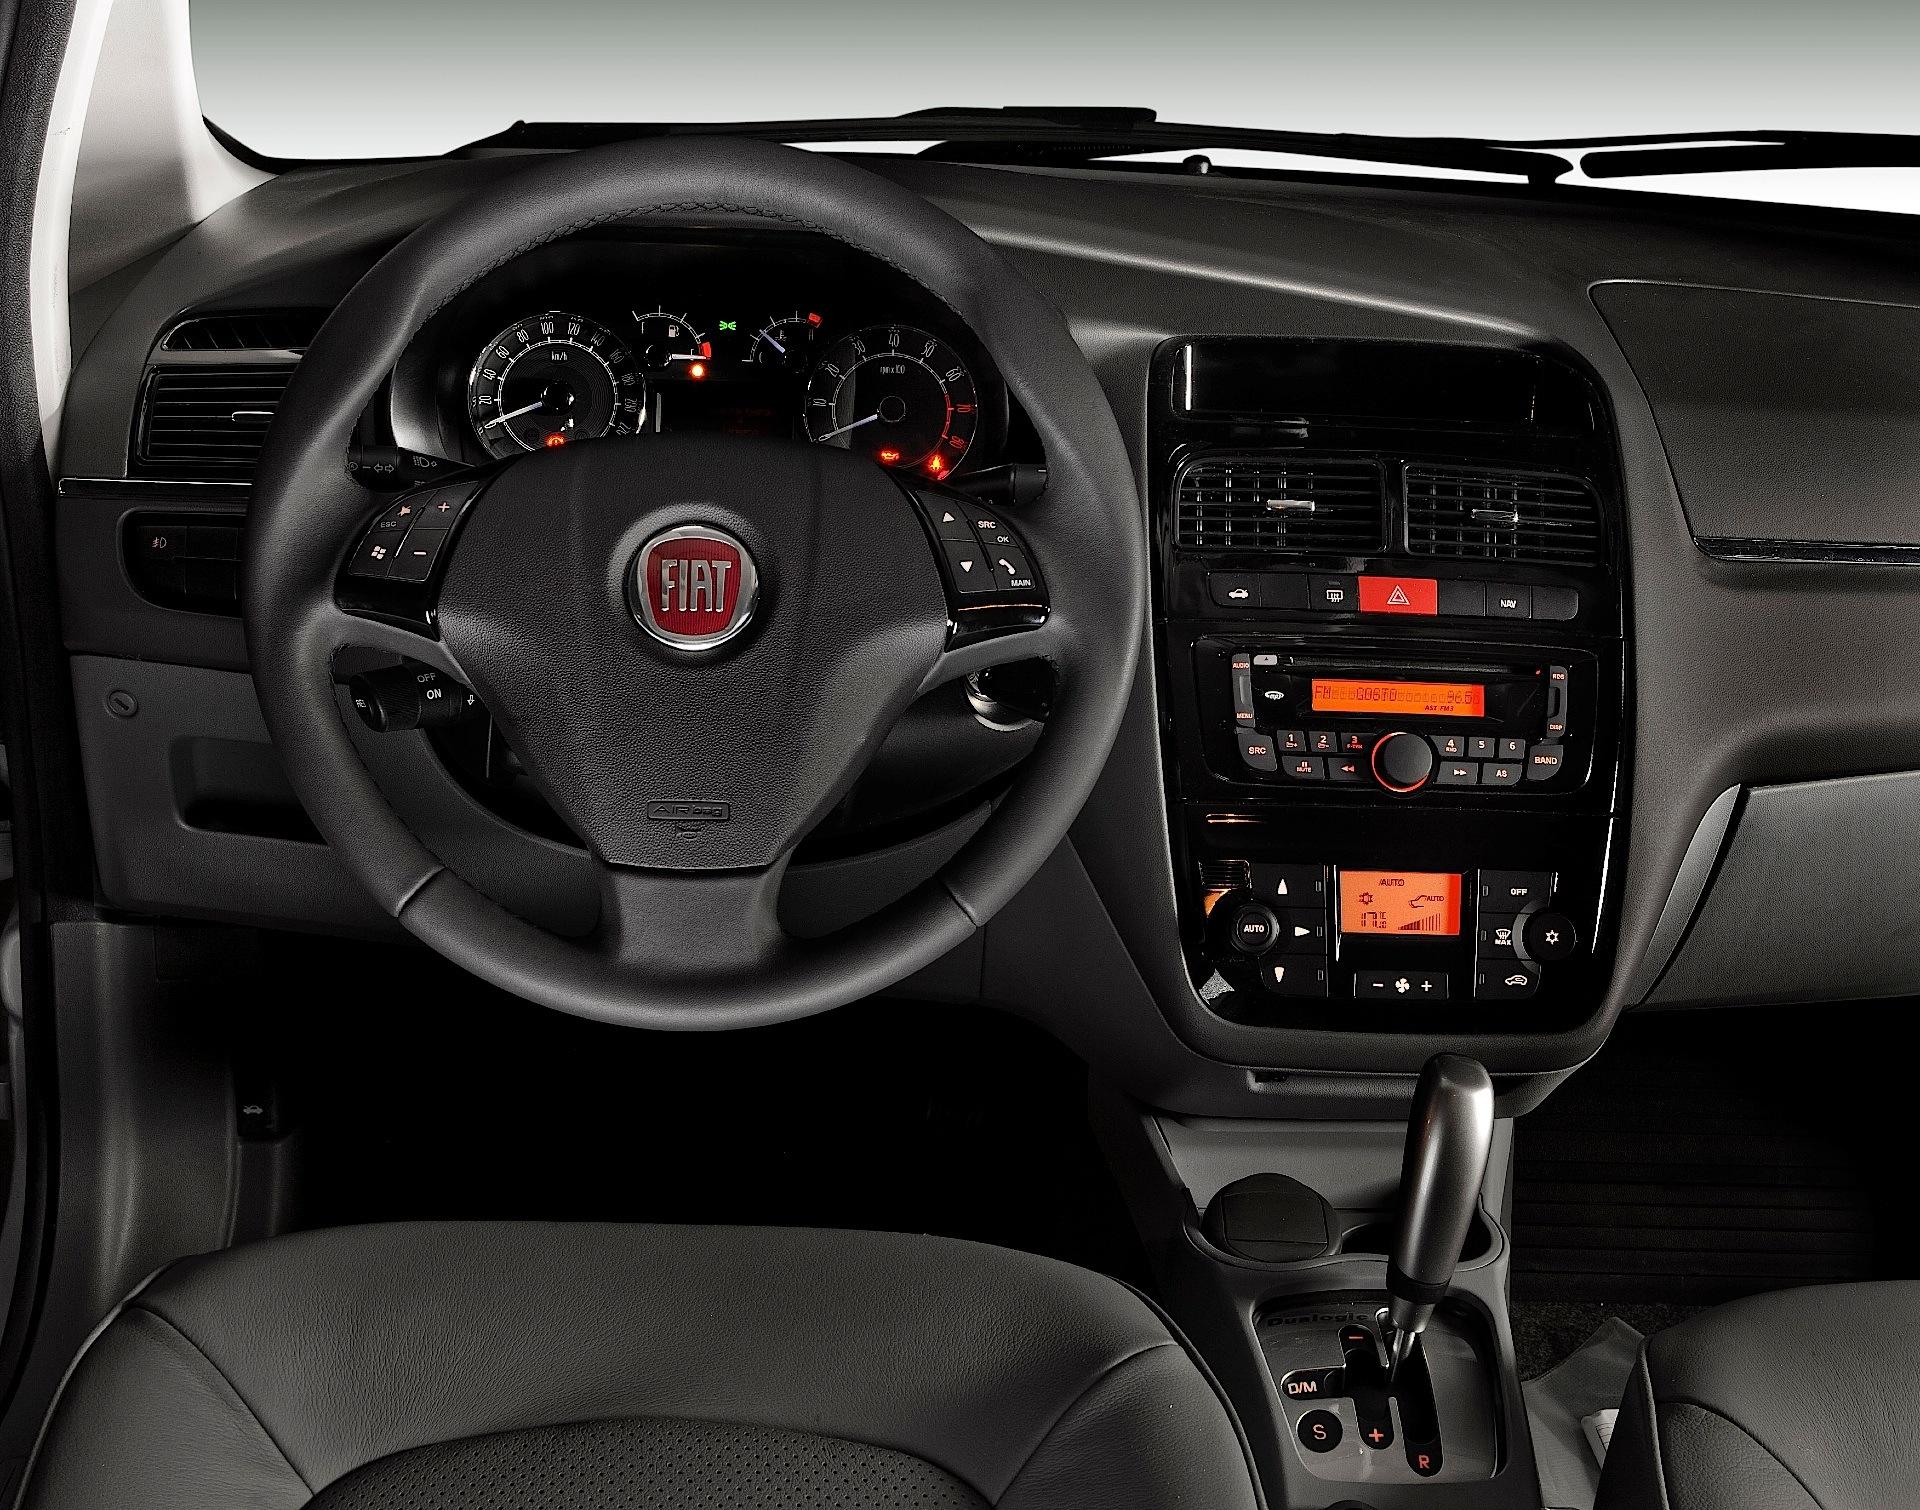 FIAT Linea specs - 2006, 2007, 2008, 2009, 2010, 2011, 2012, 2013, 2014, 2015 - autoevolution